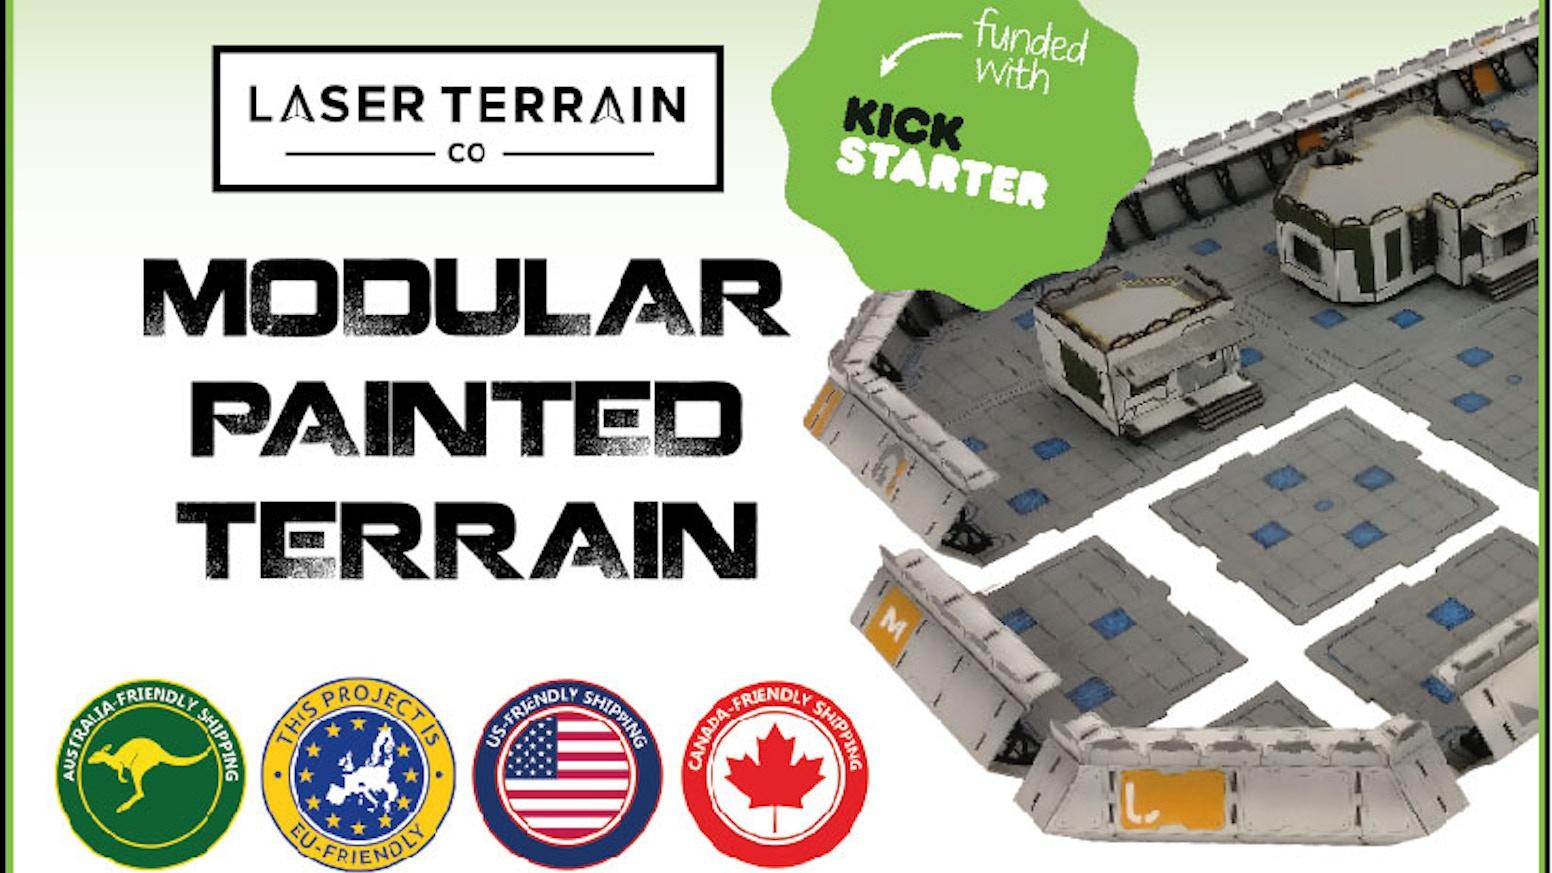 laser terrain co - modular painted terrainlaser terrain co